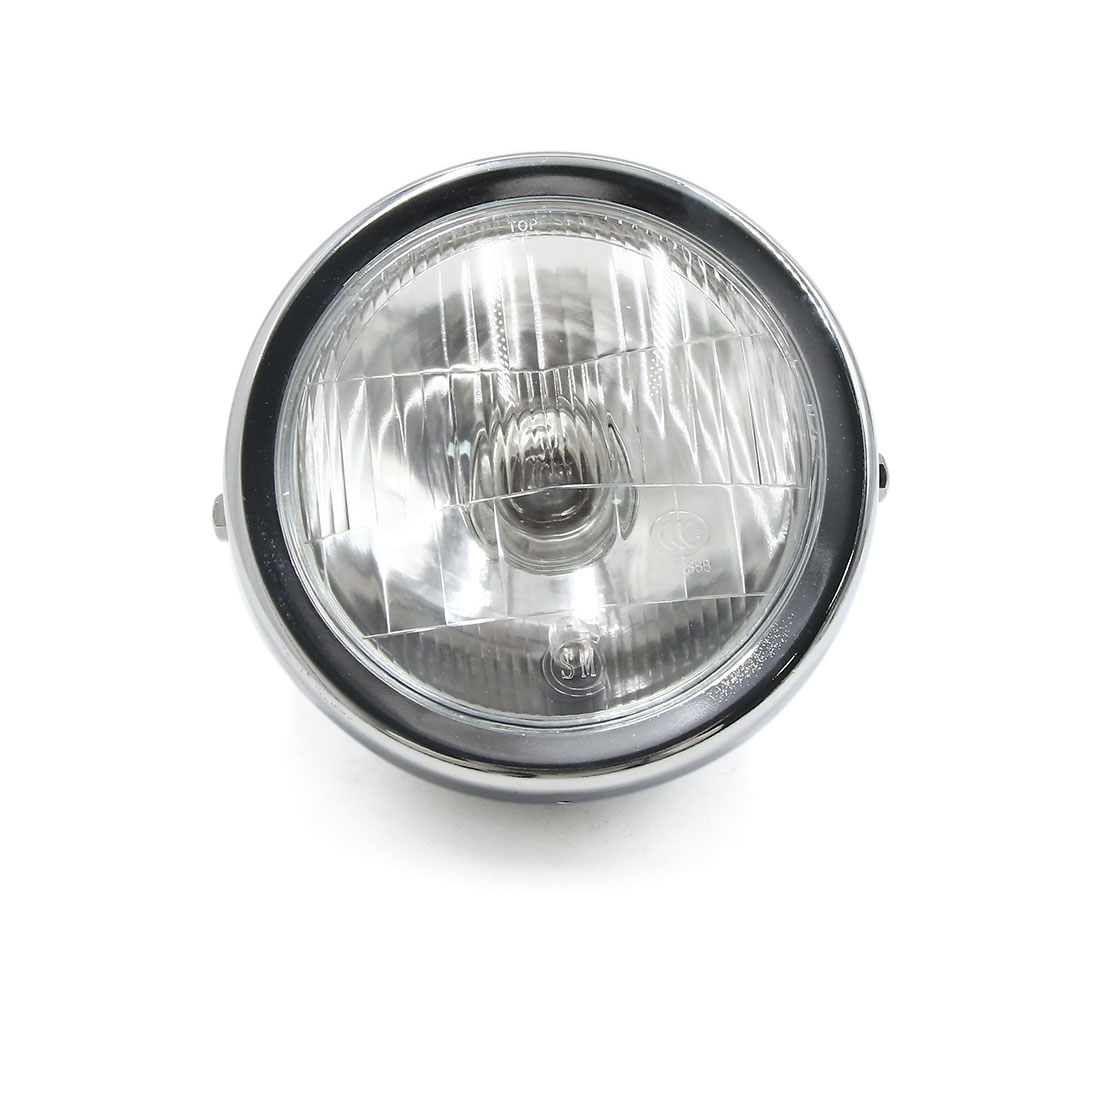 "12V 35W 6.5"" Chrome Shell Yellow Headlight w Square Mesh Cover for Harley - image 2 de 6"